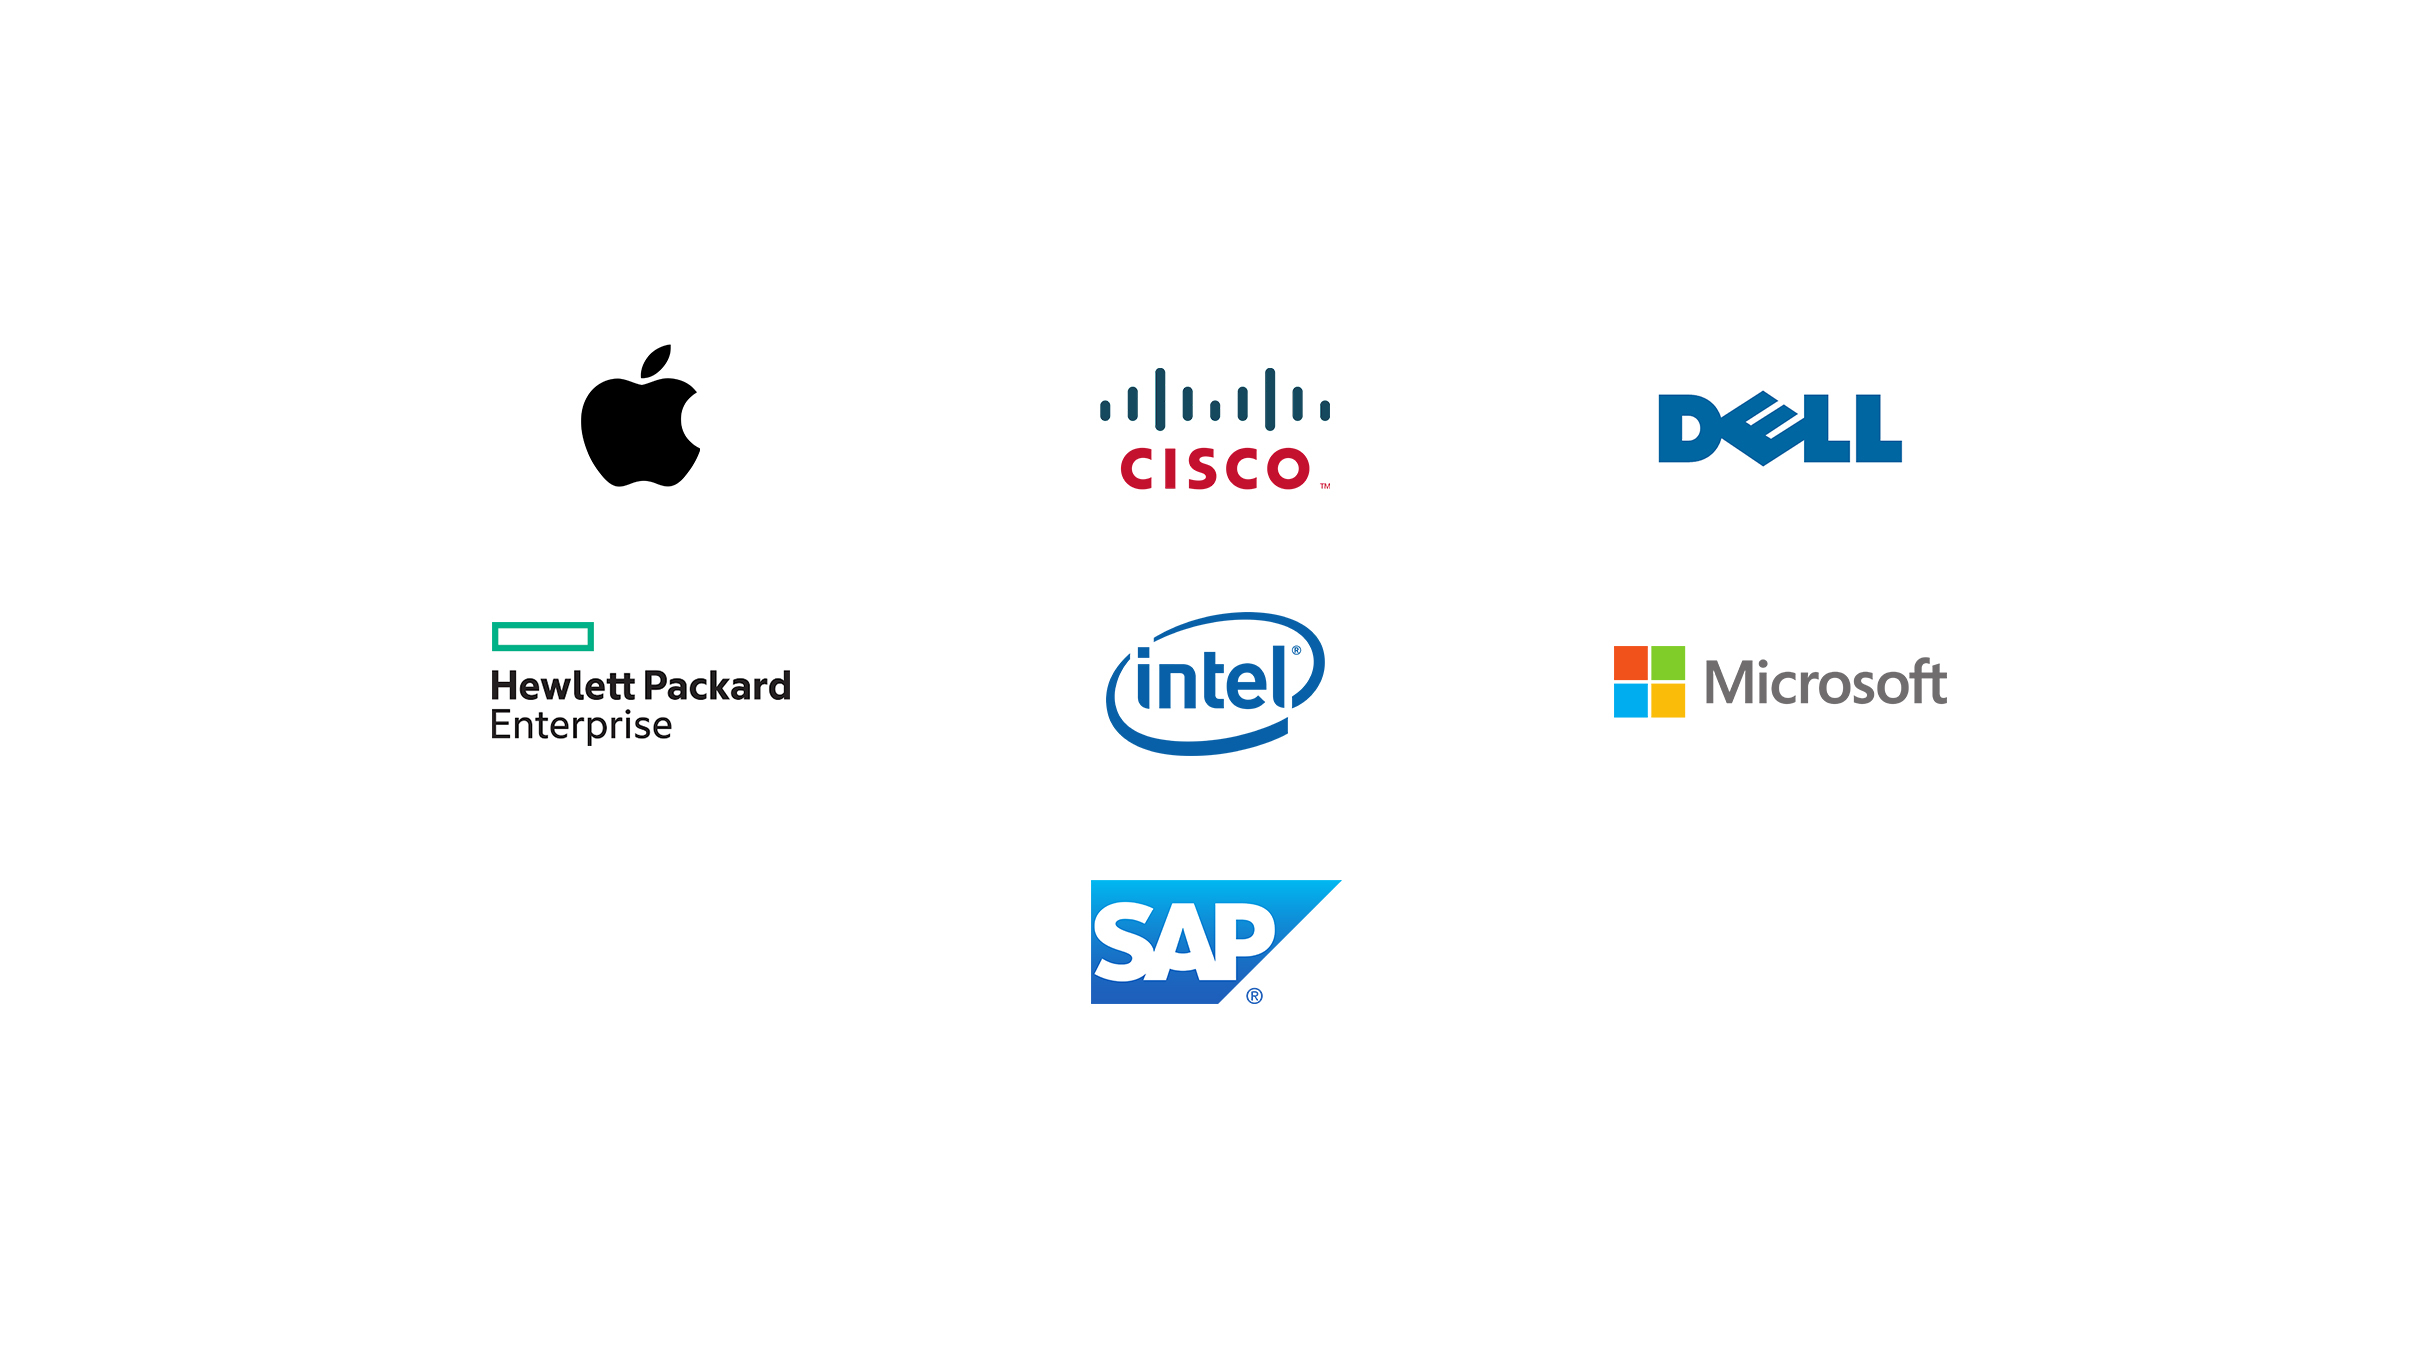 logo-collage-technology-partners-2432x1368-v2.jpg